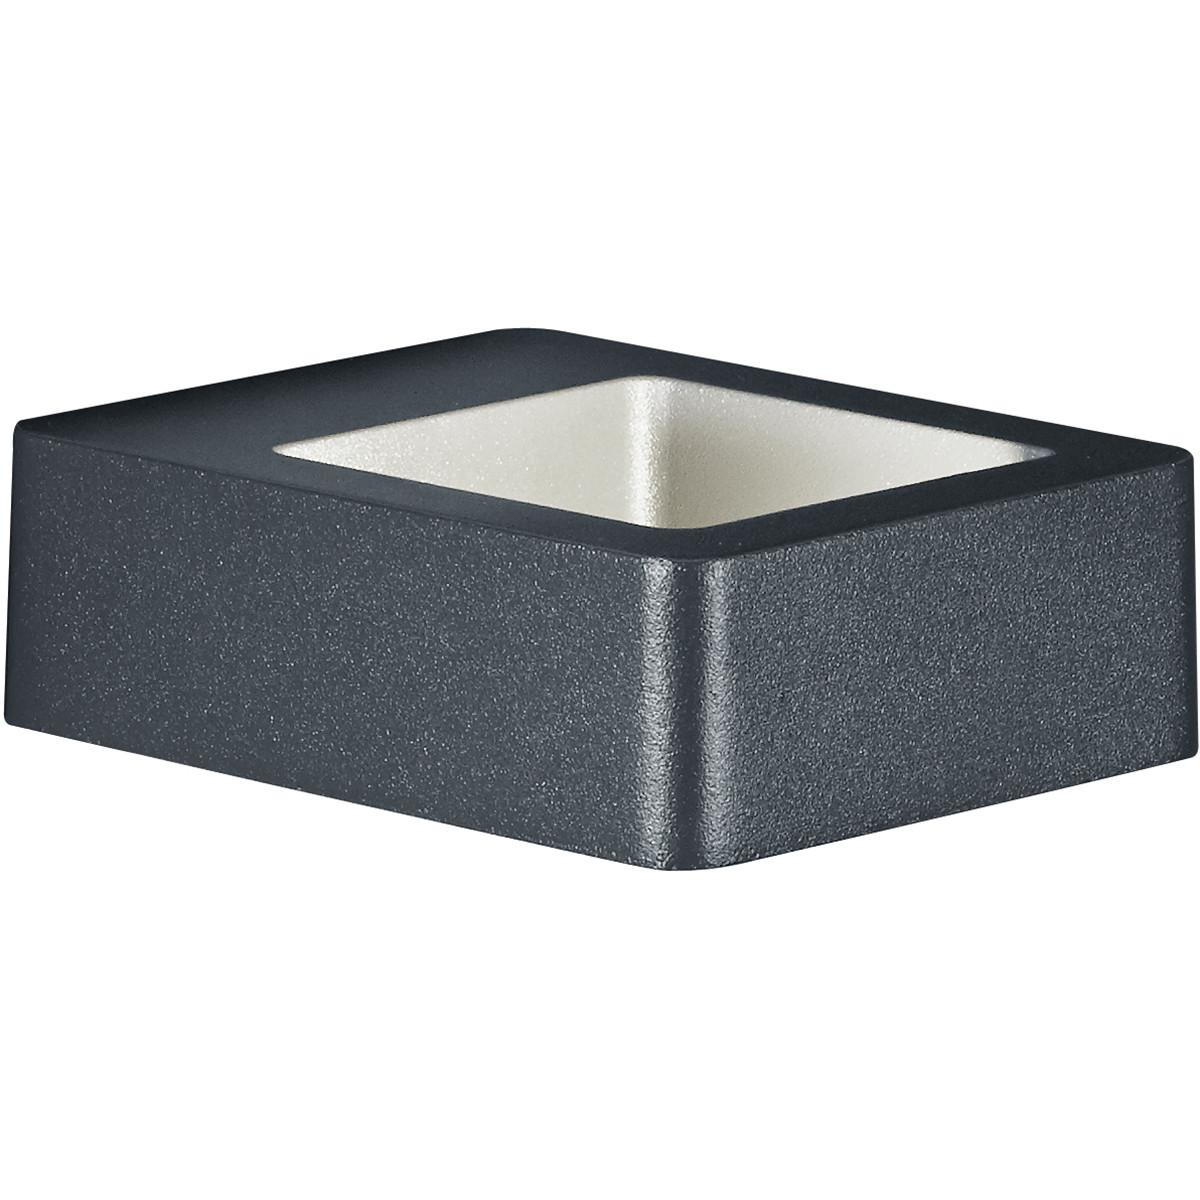 LED Tuinverlichting - Tuinlamp - Trion Riona - Wand - 4W - Warm Wit 3000K - Mat Zwart - Aluminium